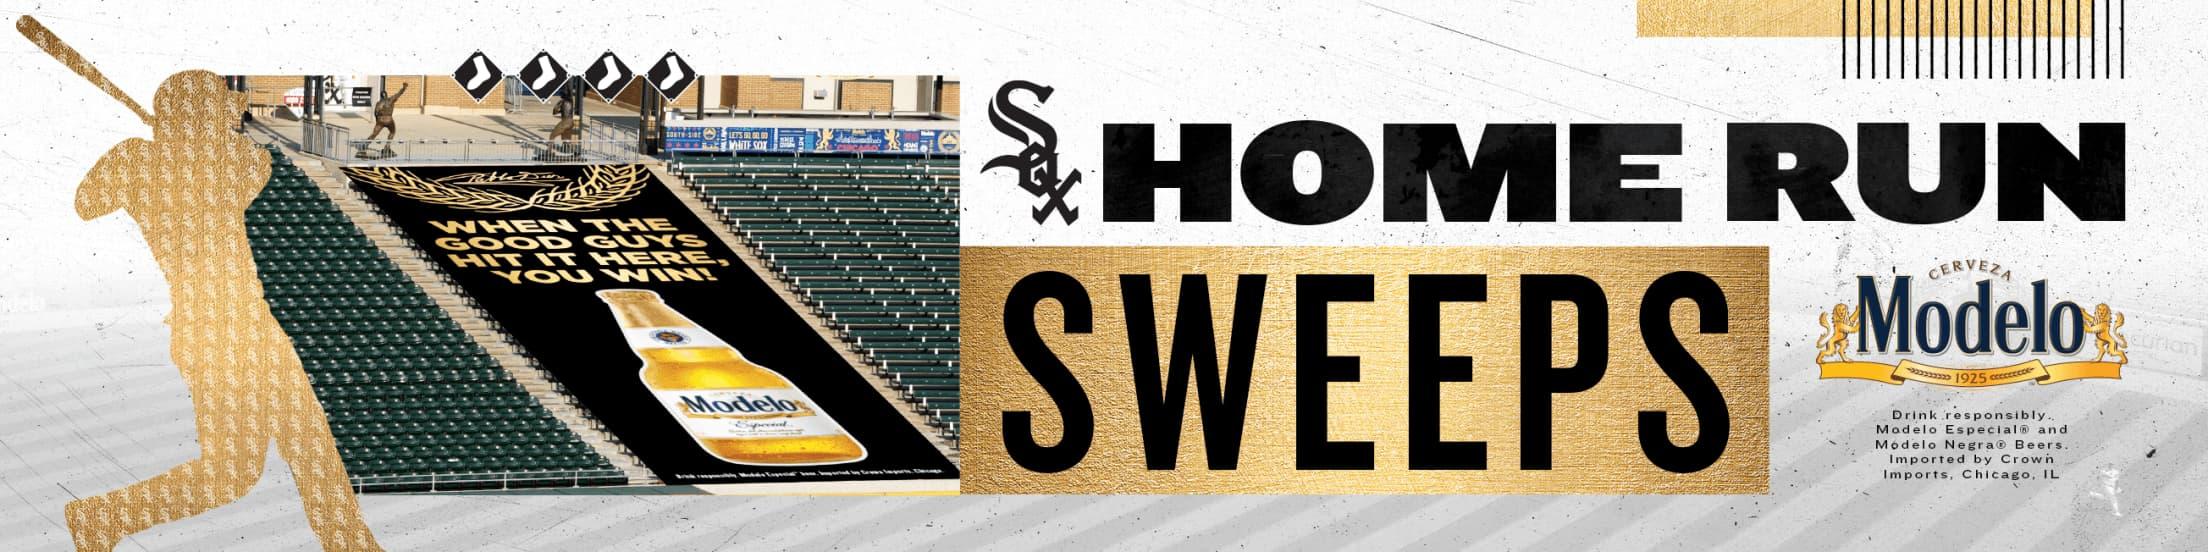 Chicago White Sox Modelo Sweepstakes 2020